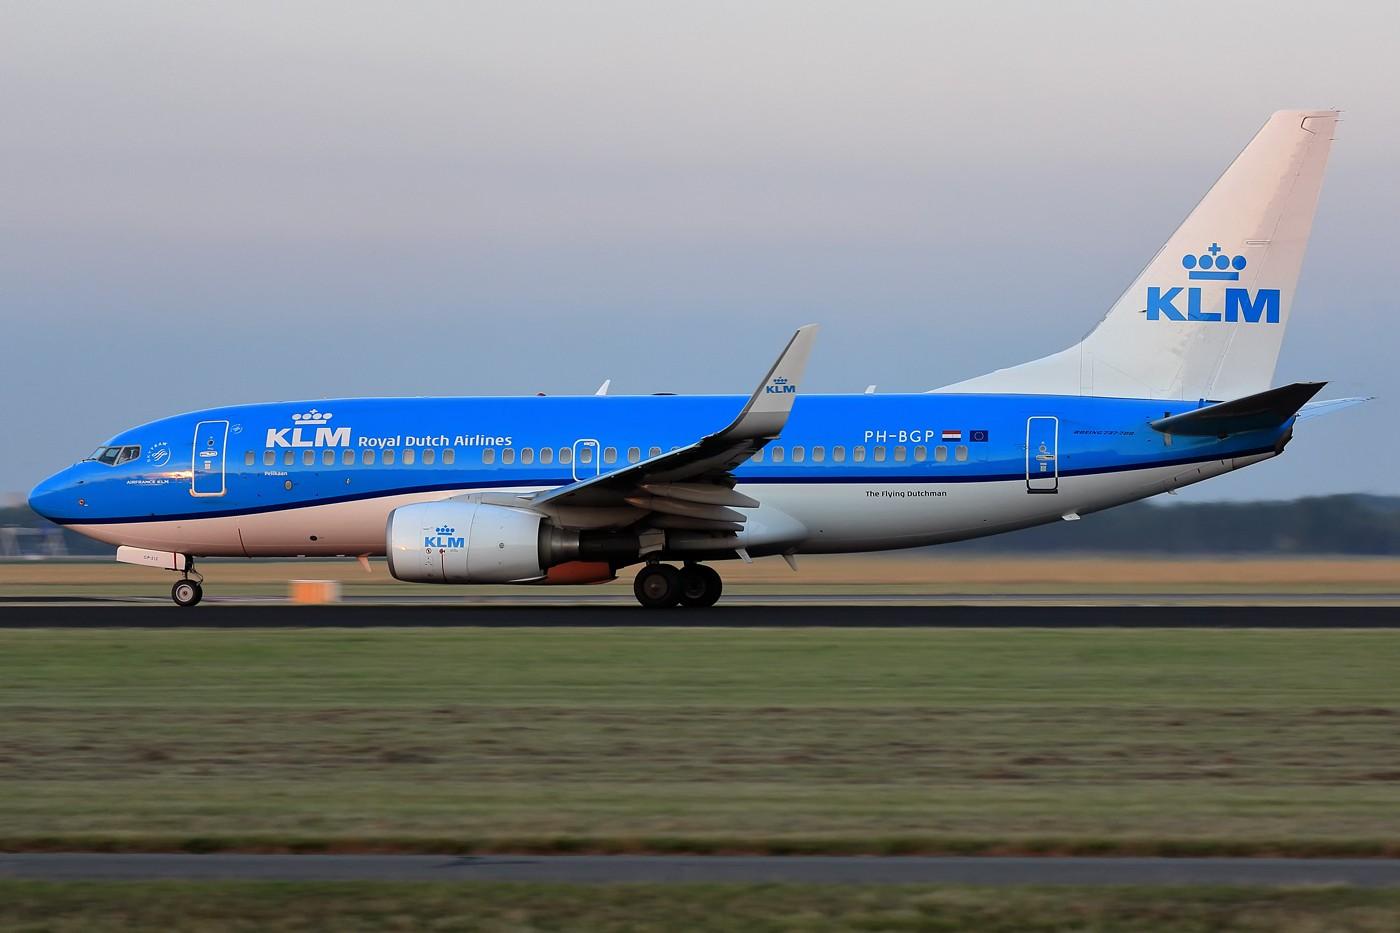 Re:[原创]【AMS】傍晚小动感一组 BOEING 737-700 PH-BGP 荷兰阿姆斯特丹史基浦机场